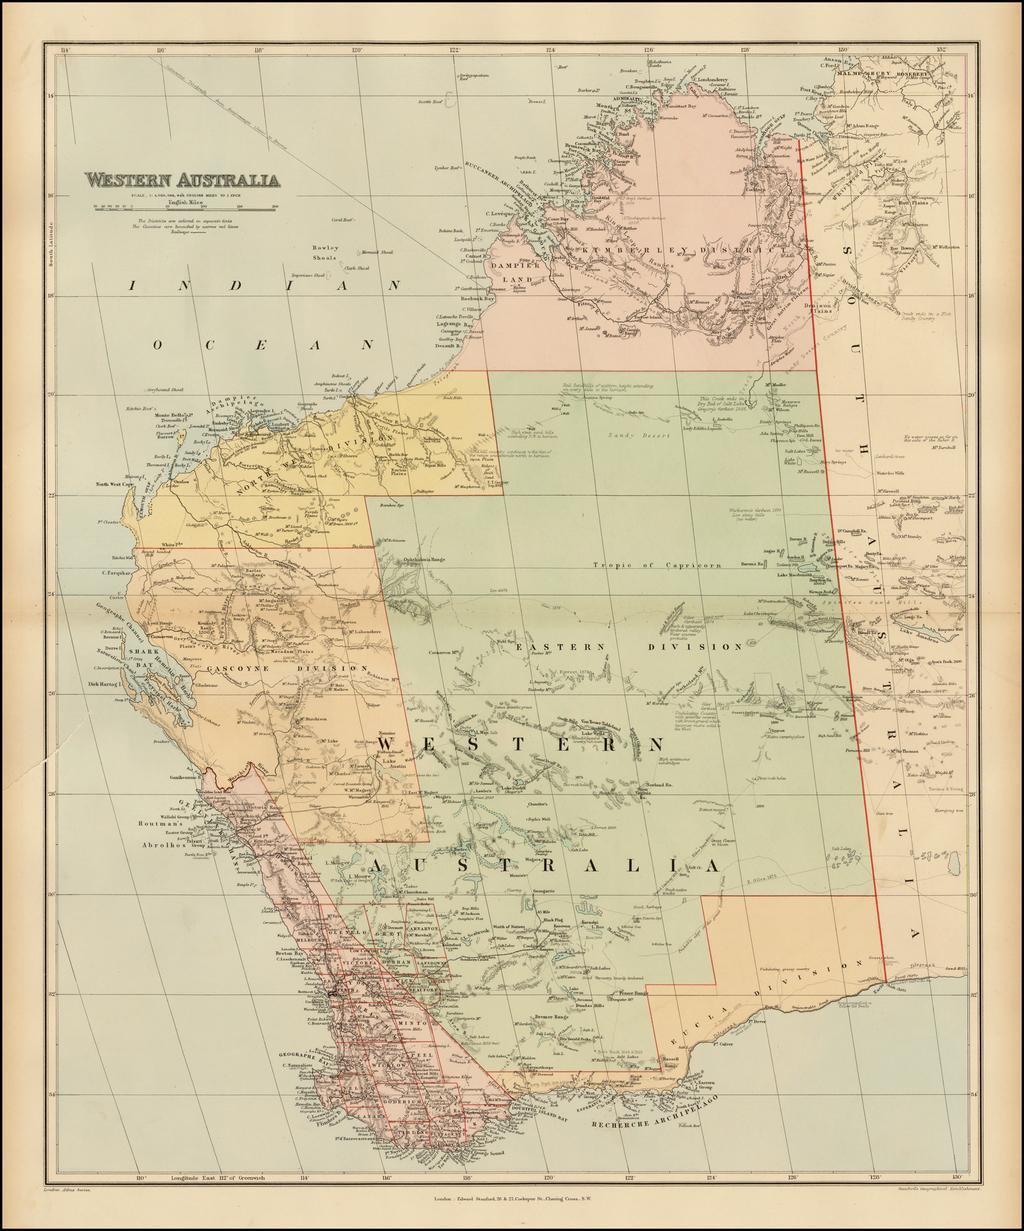 Western Australia By Edward Stanford